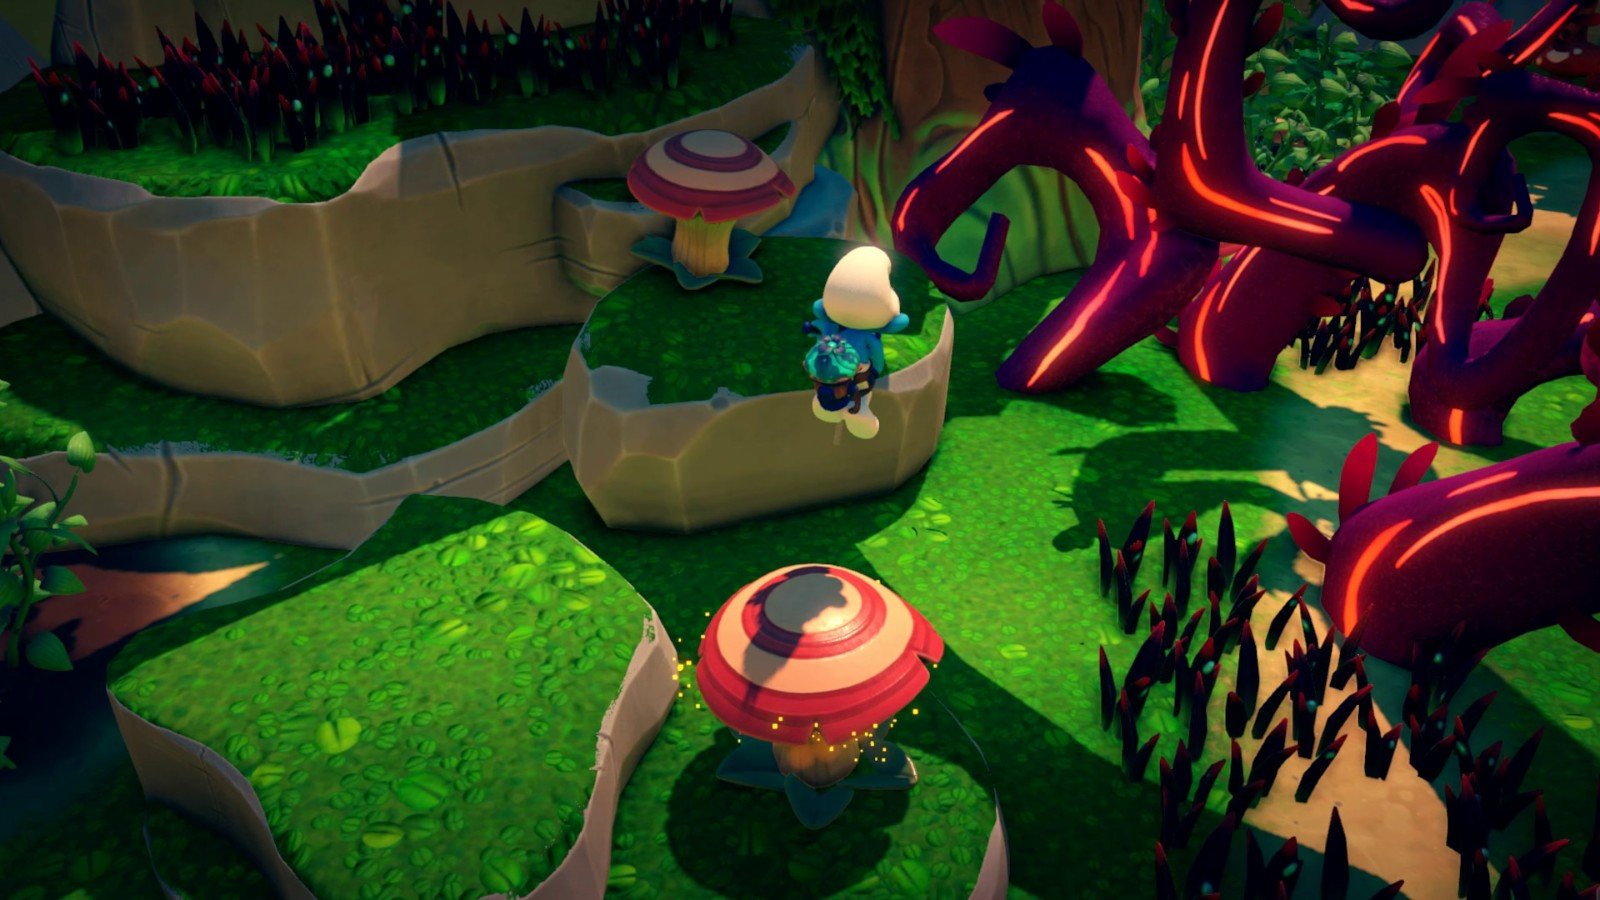 3D《蓝精灵》发布首个预告 邪恶的植物维拉夫上线